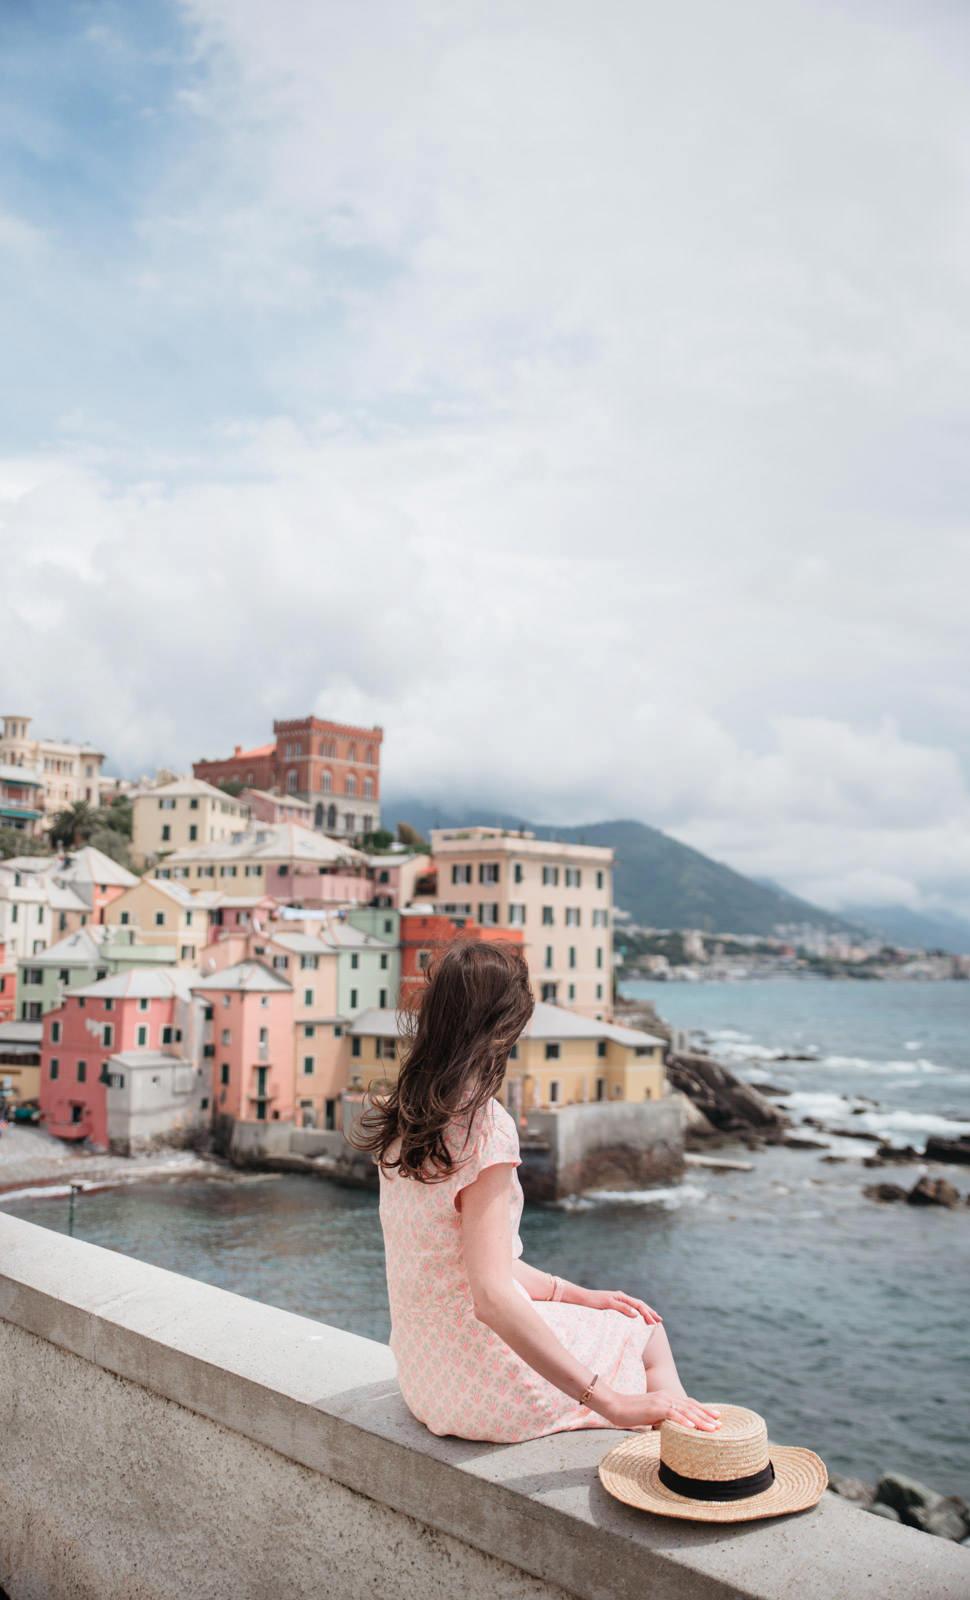 Blog-Mode-And-The-City-Lifestyle-Italie-Bocadasse-Camogli-Sestri-Levante-5